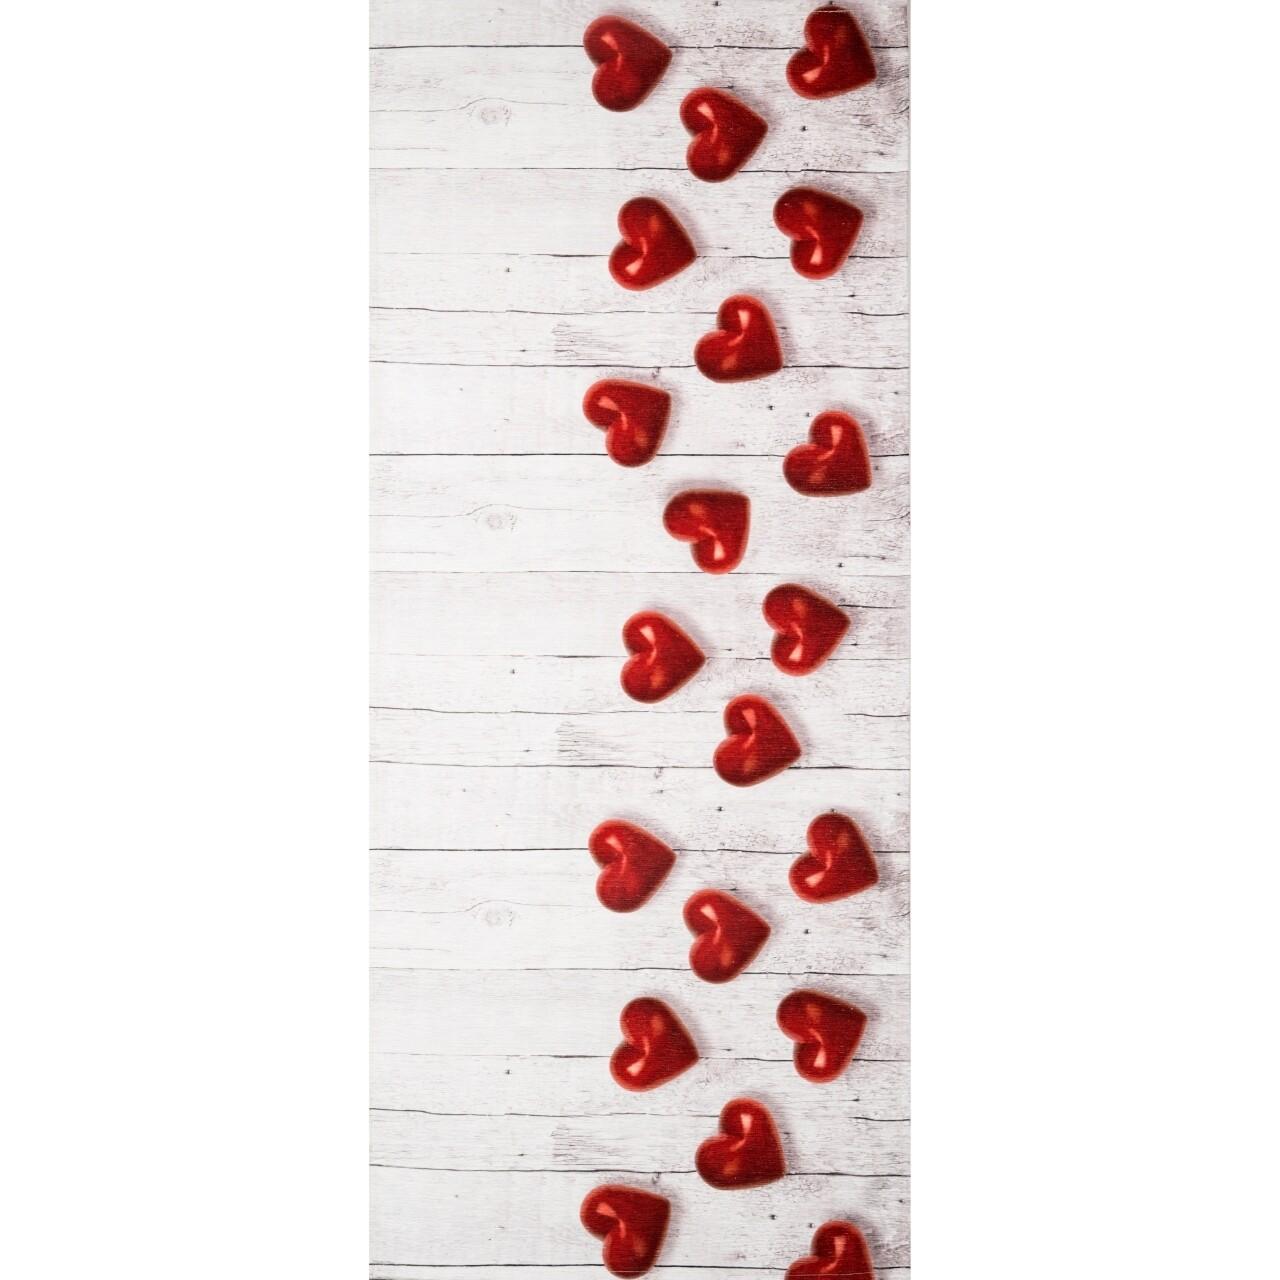 Covor rezistent Webtappeti Cuori Rossi 58x140 cm, bej/rosu